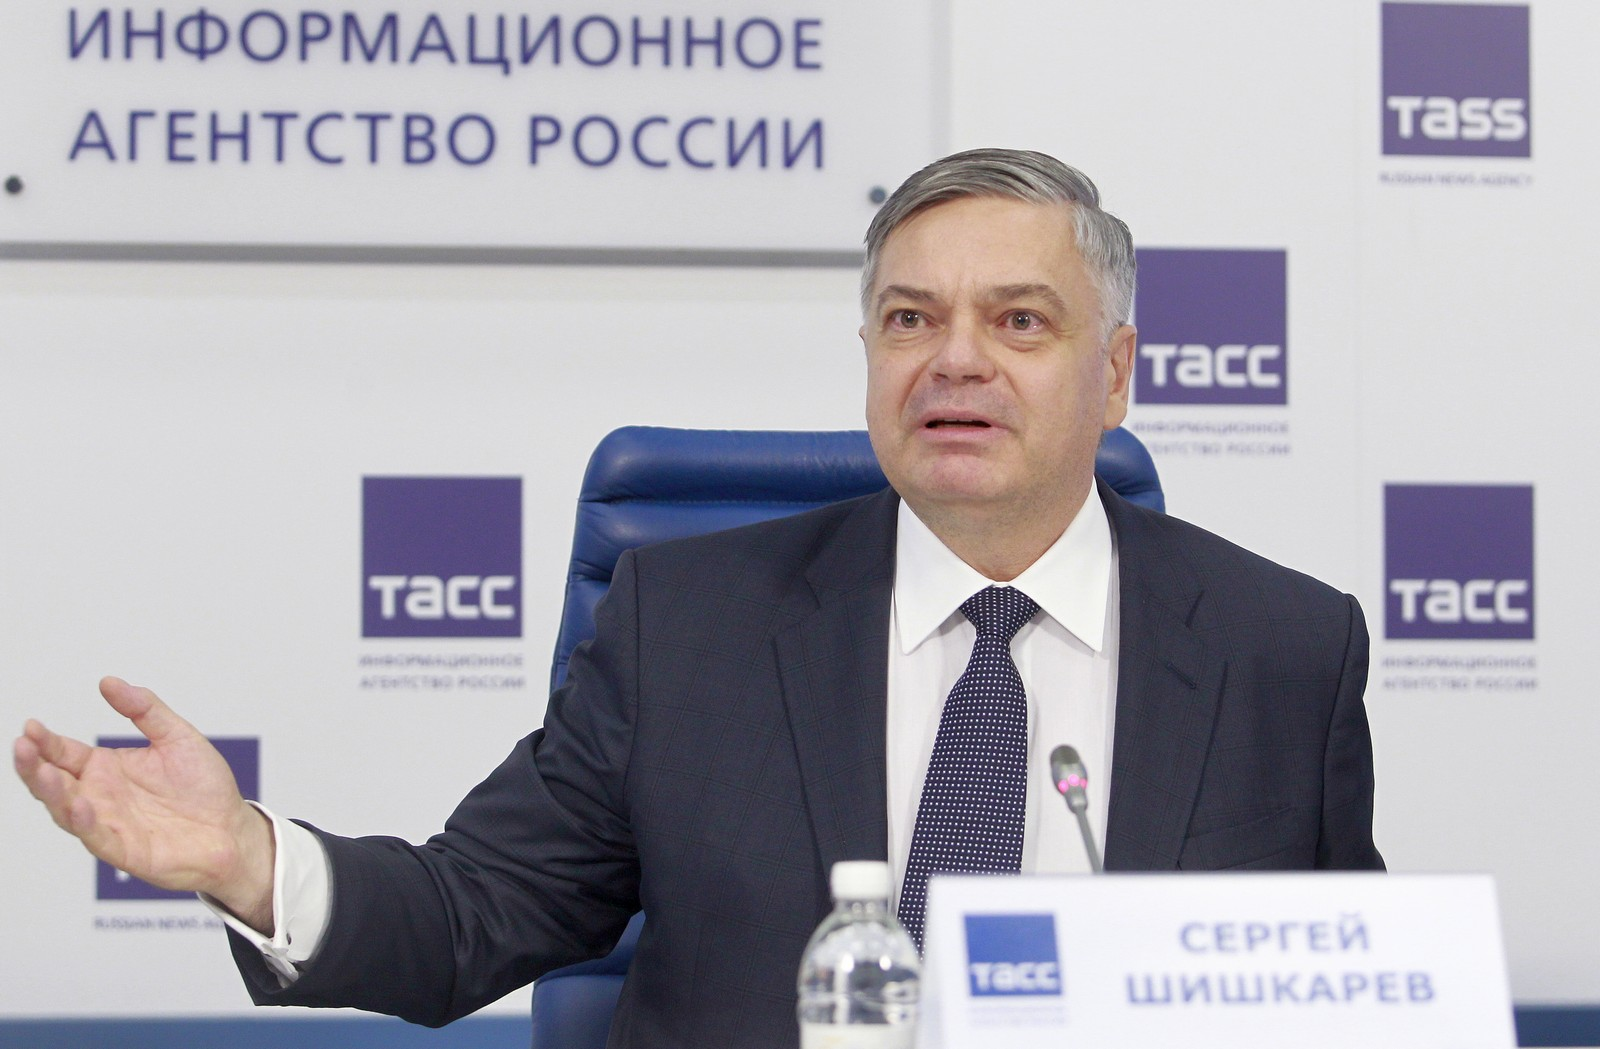 Сергей Шишкарёв